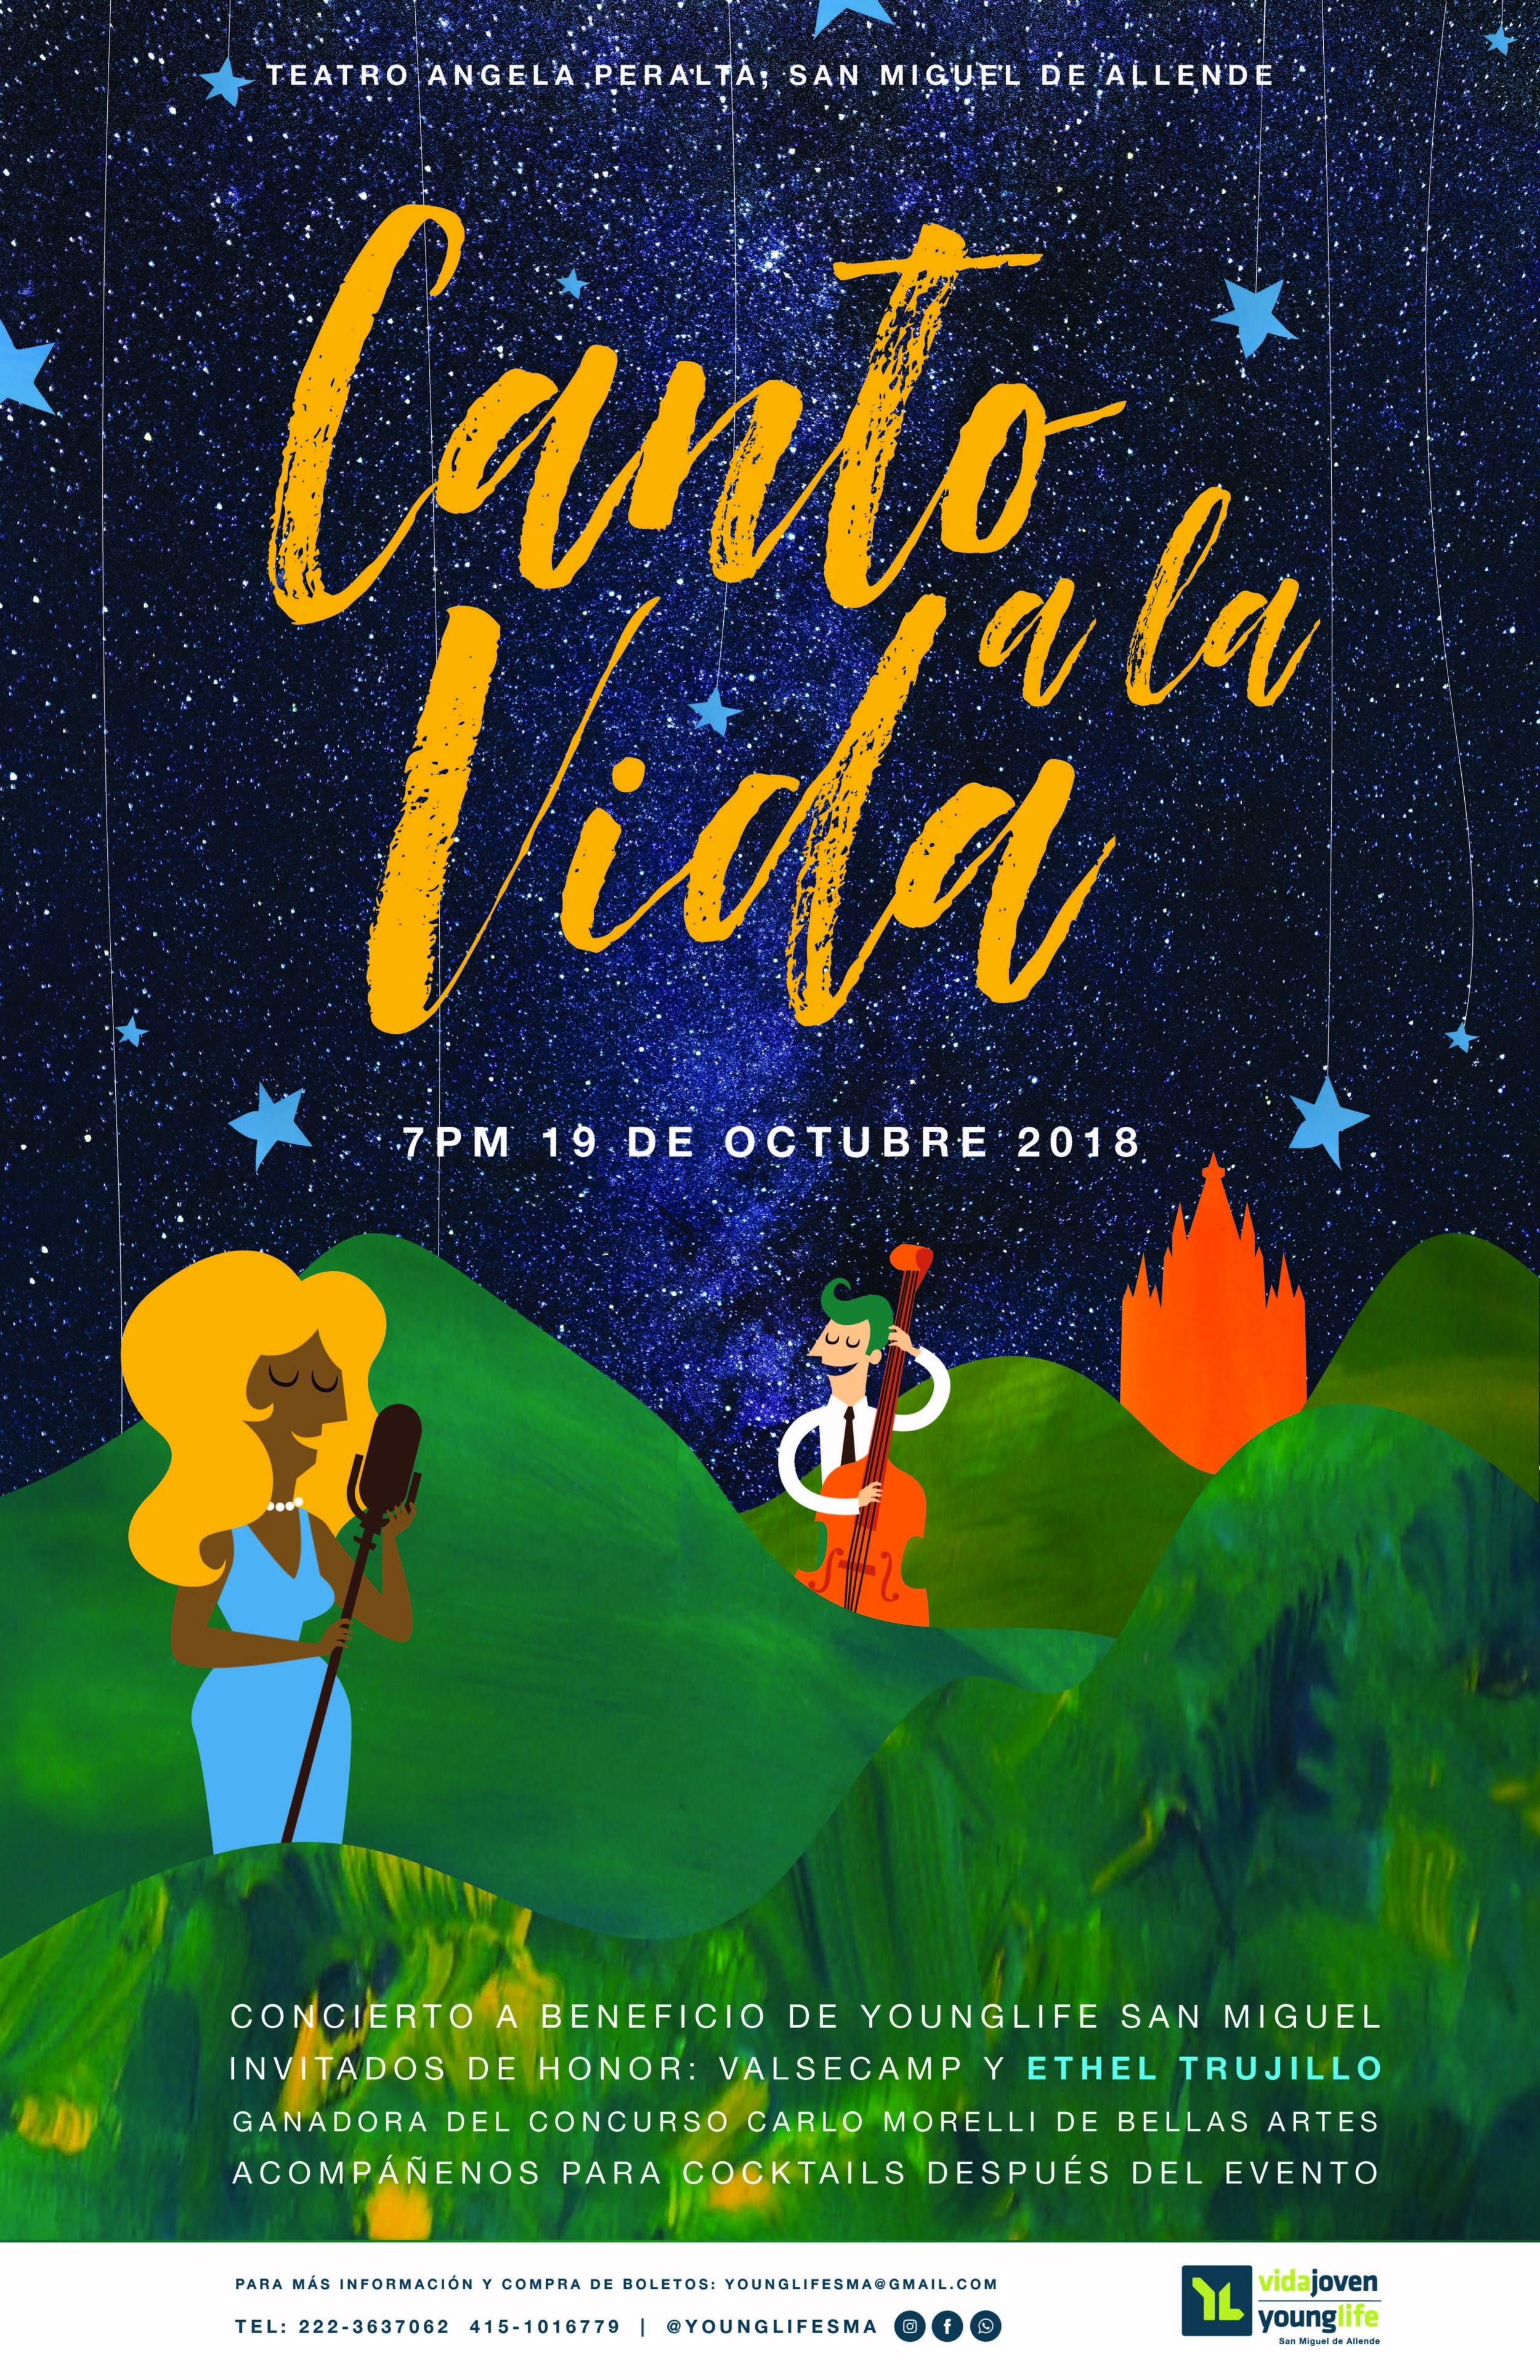 CANTO A LA VIDA 2-03.jpg